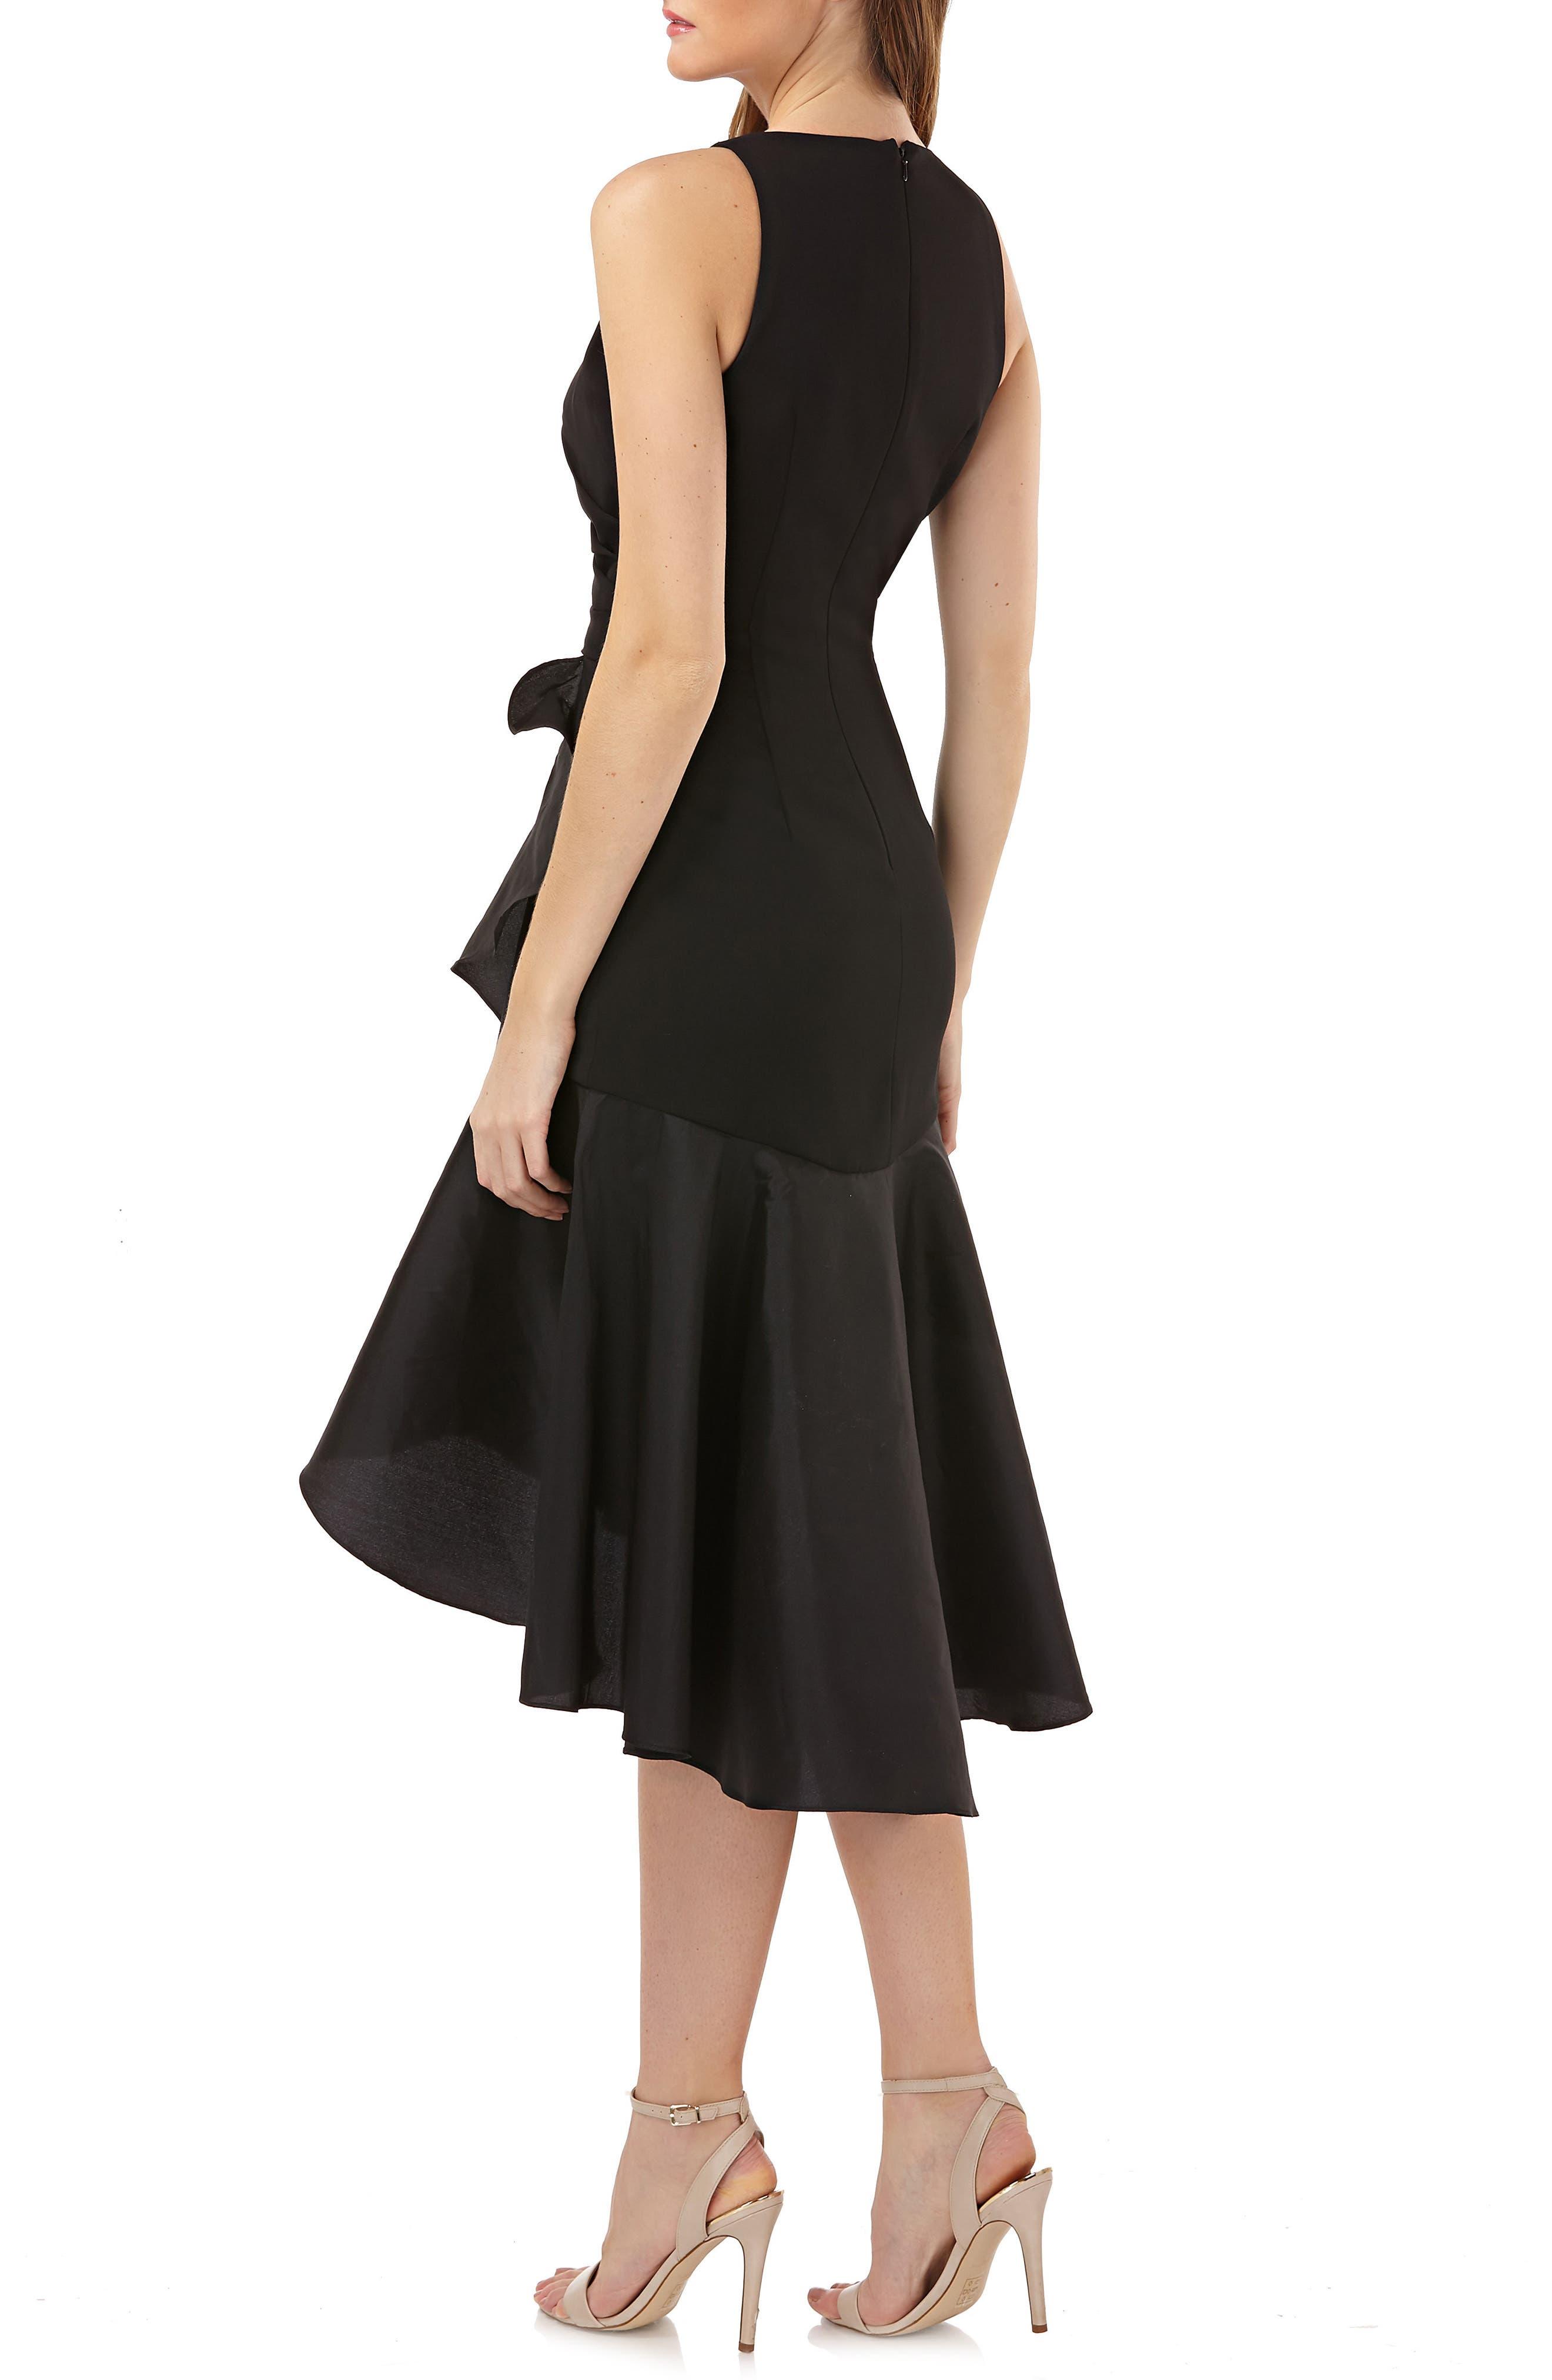 Crepe Contrast Ruffle Cocktail Dress,                             Alternate thumbnail 2, color,                             BLACK